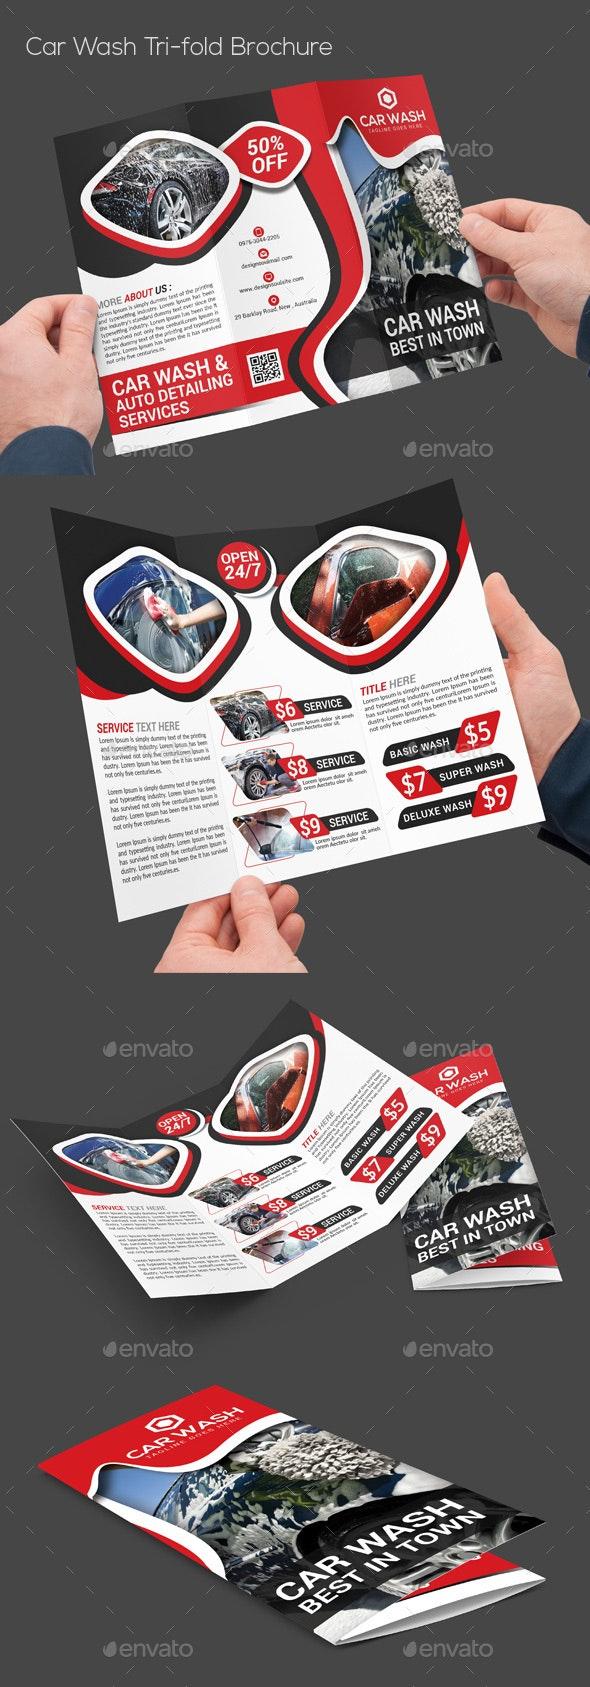 Car Wash Tri-fold Brochure - Corporate Brochures